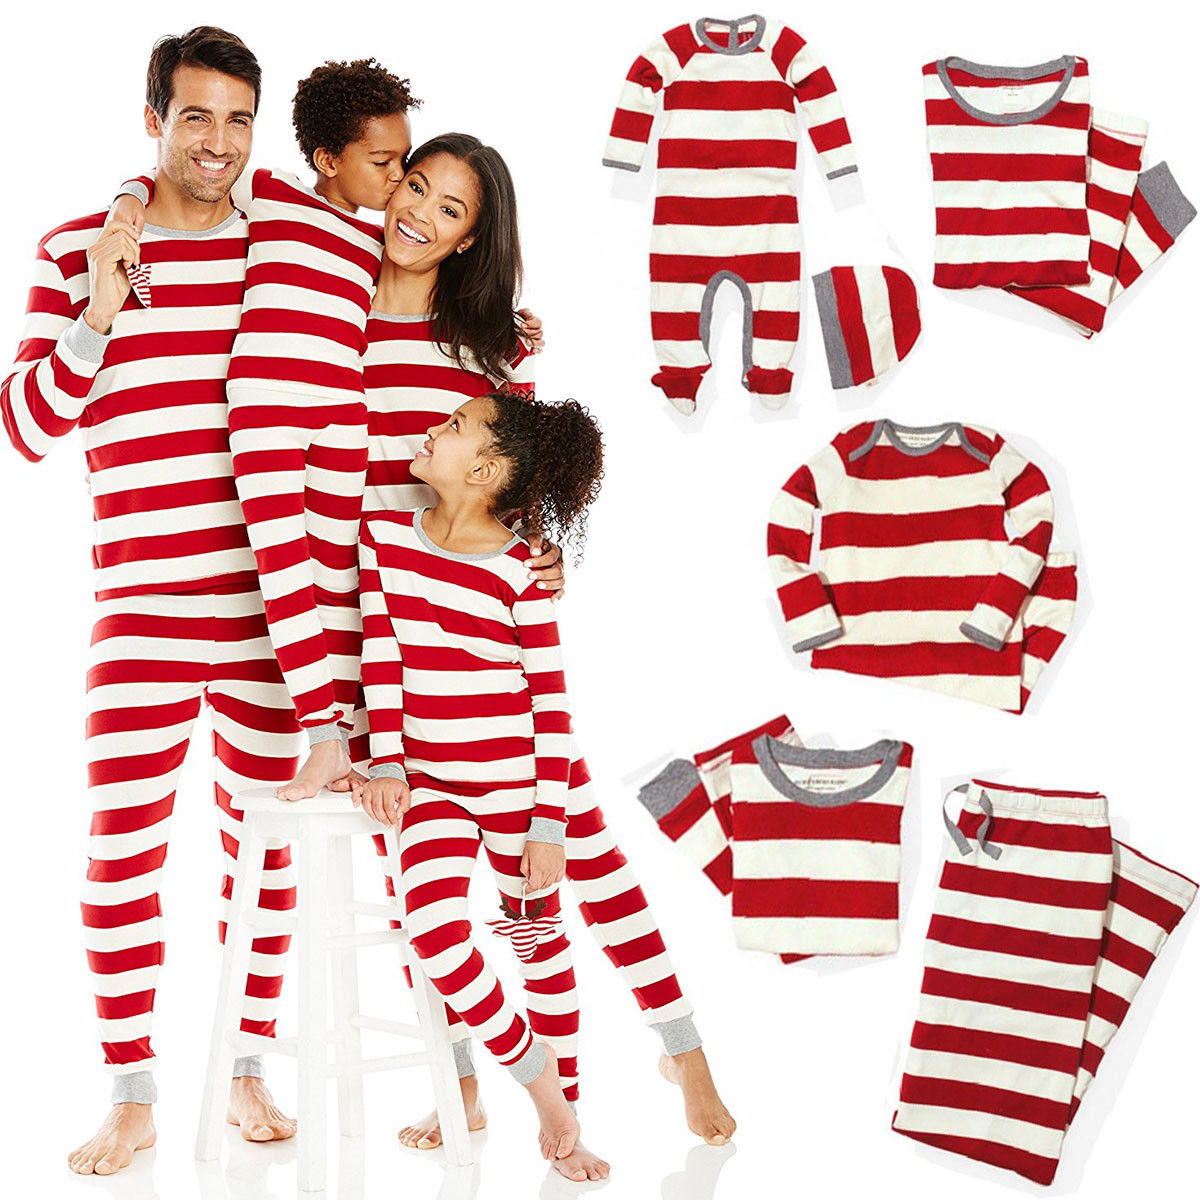 Christmas Family Pajamas Set.Us 3 0 21 Off Xmas Striped Family Matching Outfits Set Christmas Family Pajamas Set Adult Kid Sleepwear Nightwear Pjs Photgraphy Prop Clothing In